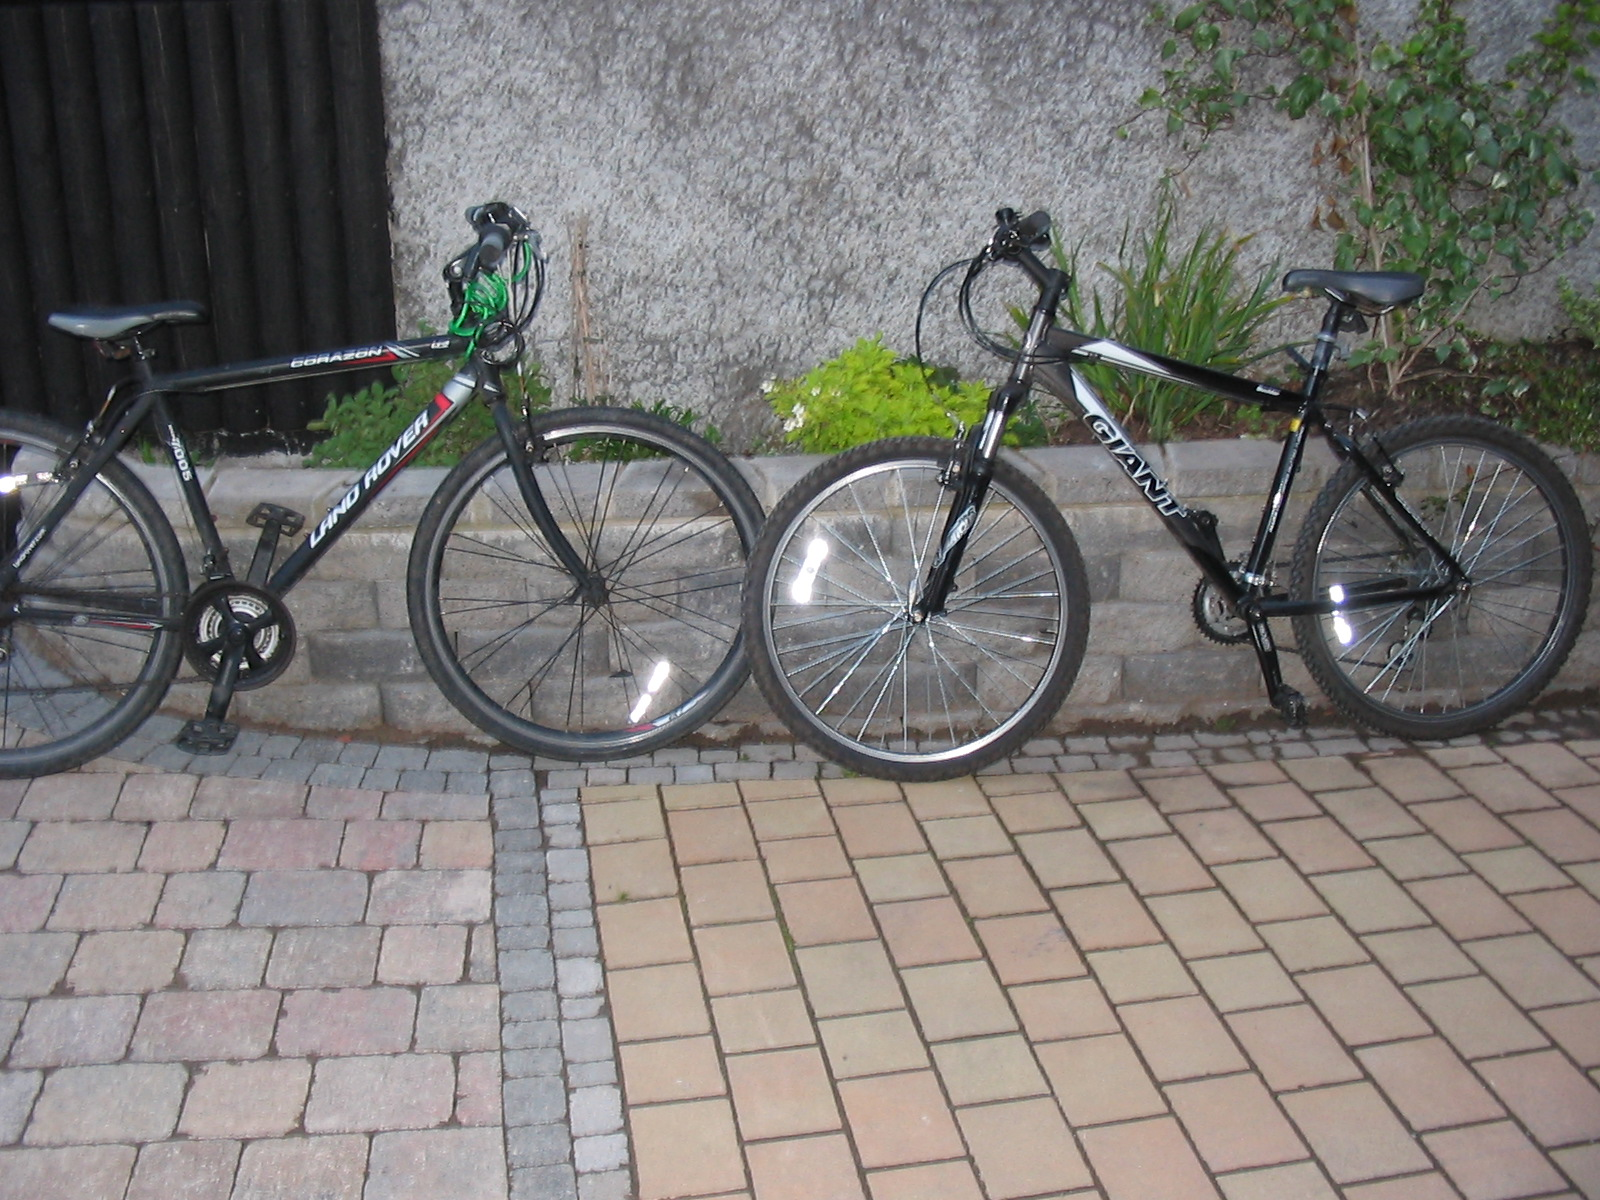 Killerjackalope's guide to urban cycling